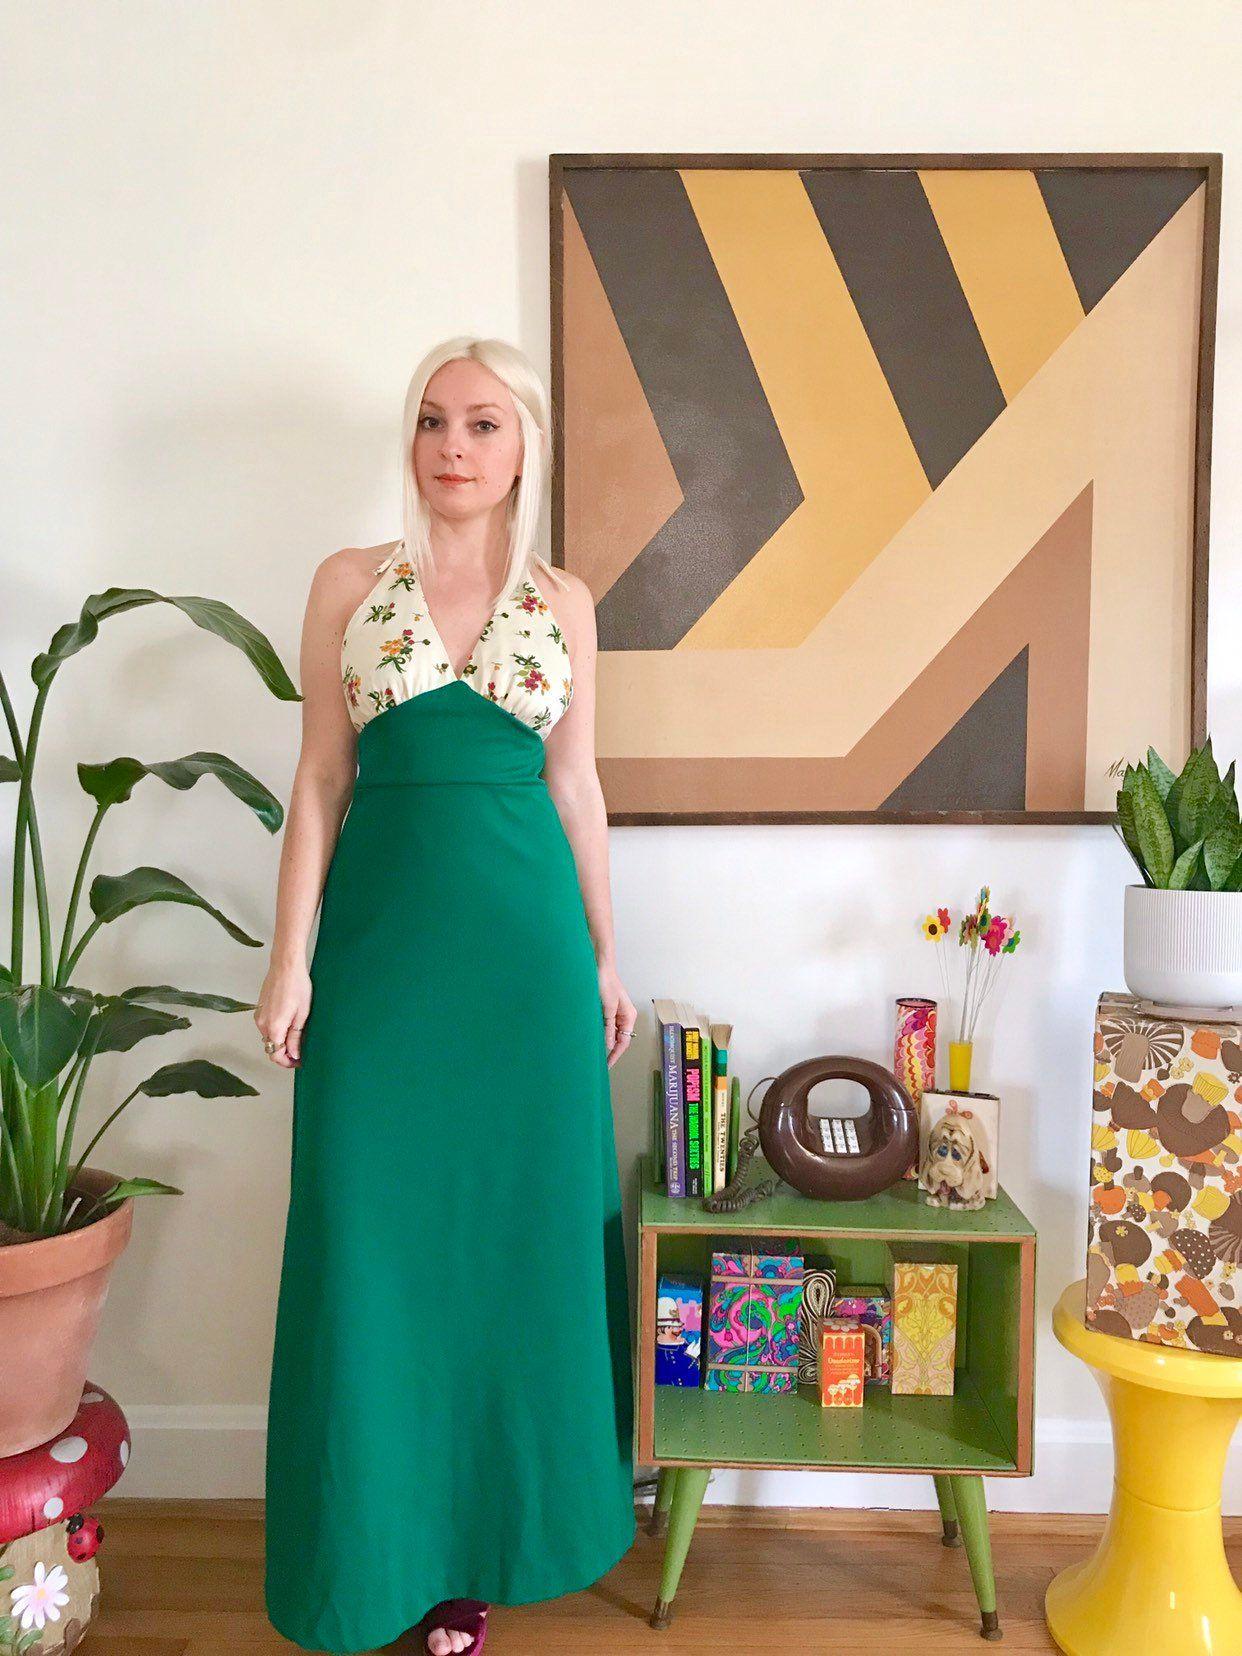 Vintage 1970s Floral Halter Back Maxi Dress Dark Green Skirt Etsy Dark Green Skirt Hippie Dresses Green Maxi Skirt [ 1656 x 1242 Pixel ]